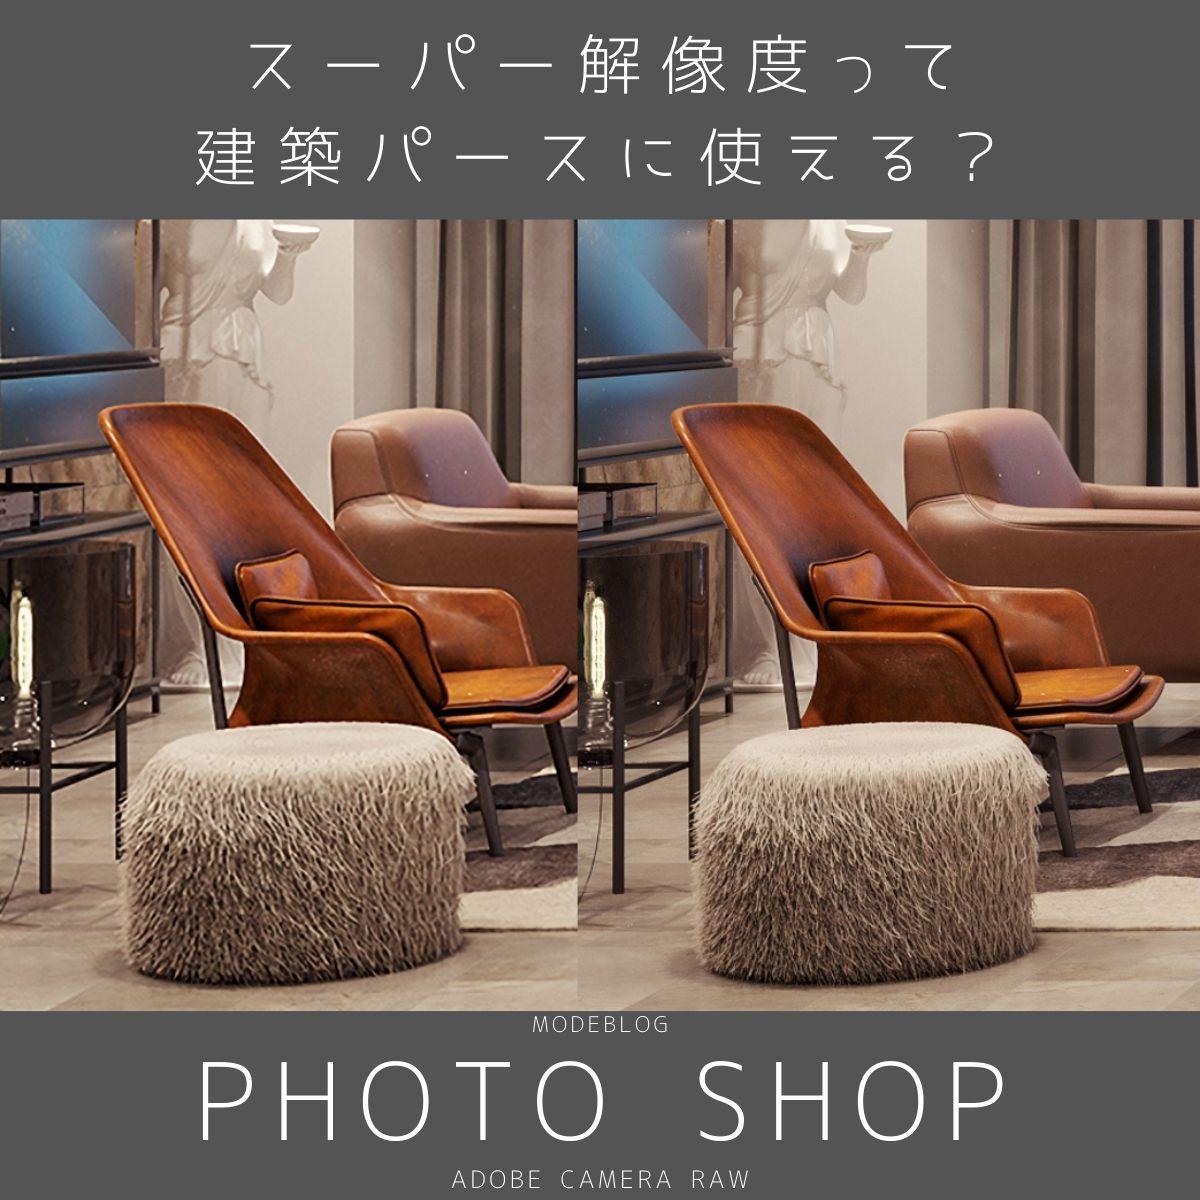 【Photoshop】 スーパー解像度って建築パースに使える?